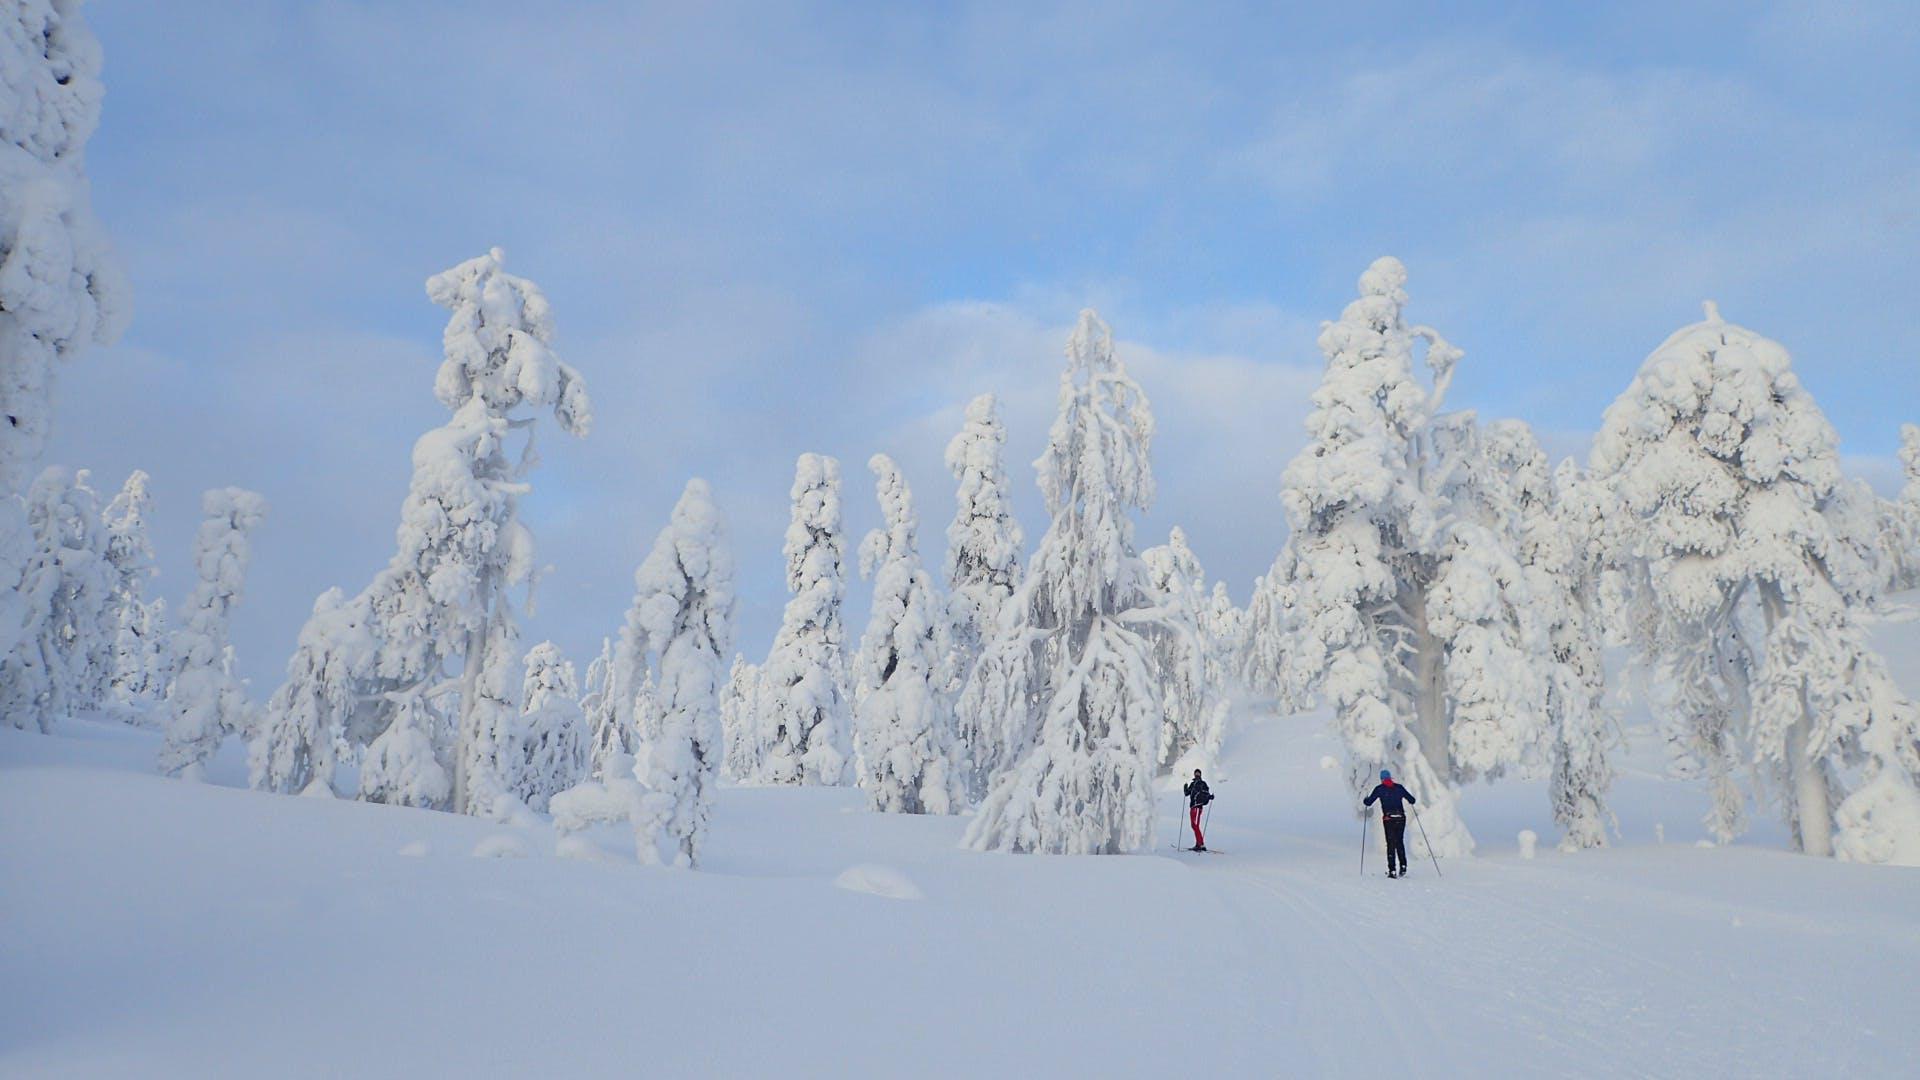 Free stock photo of Finland, snow, winter, winter wonderland